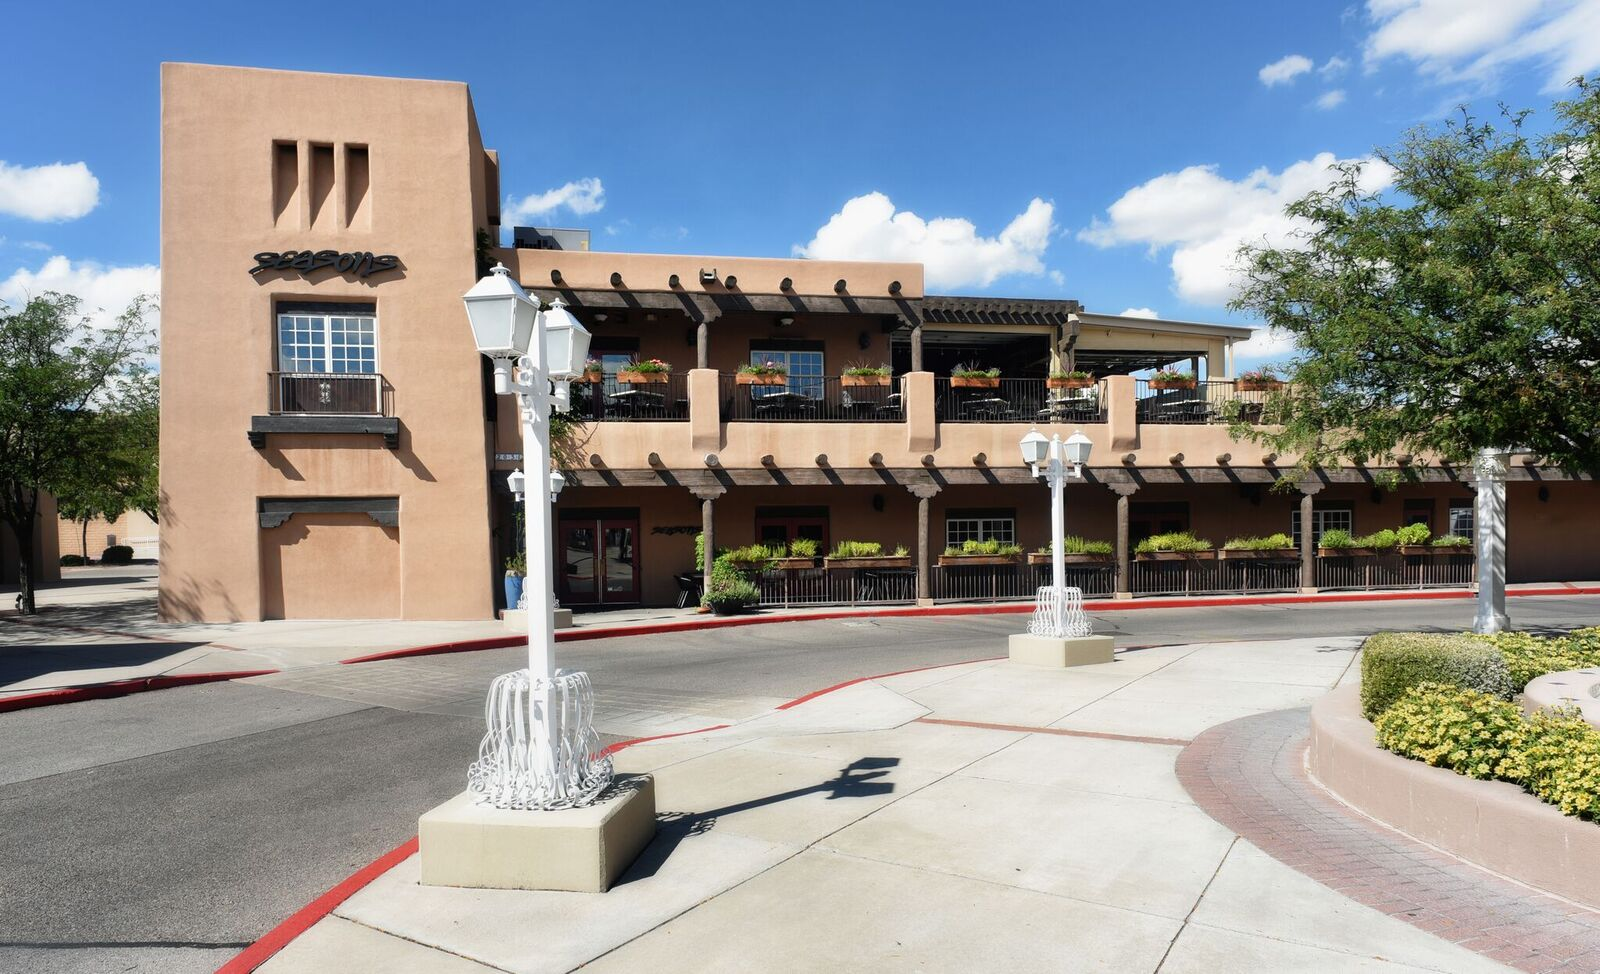 Image of Seasons Rotisserie & Grill in Durango, Colorado